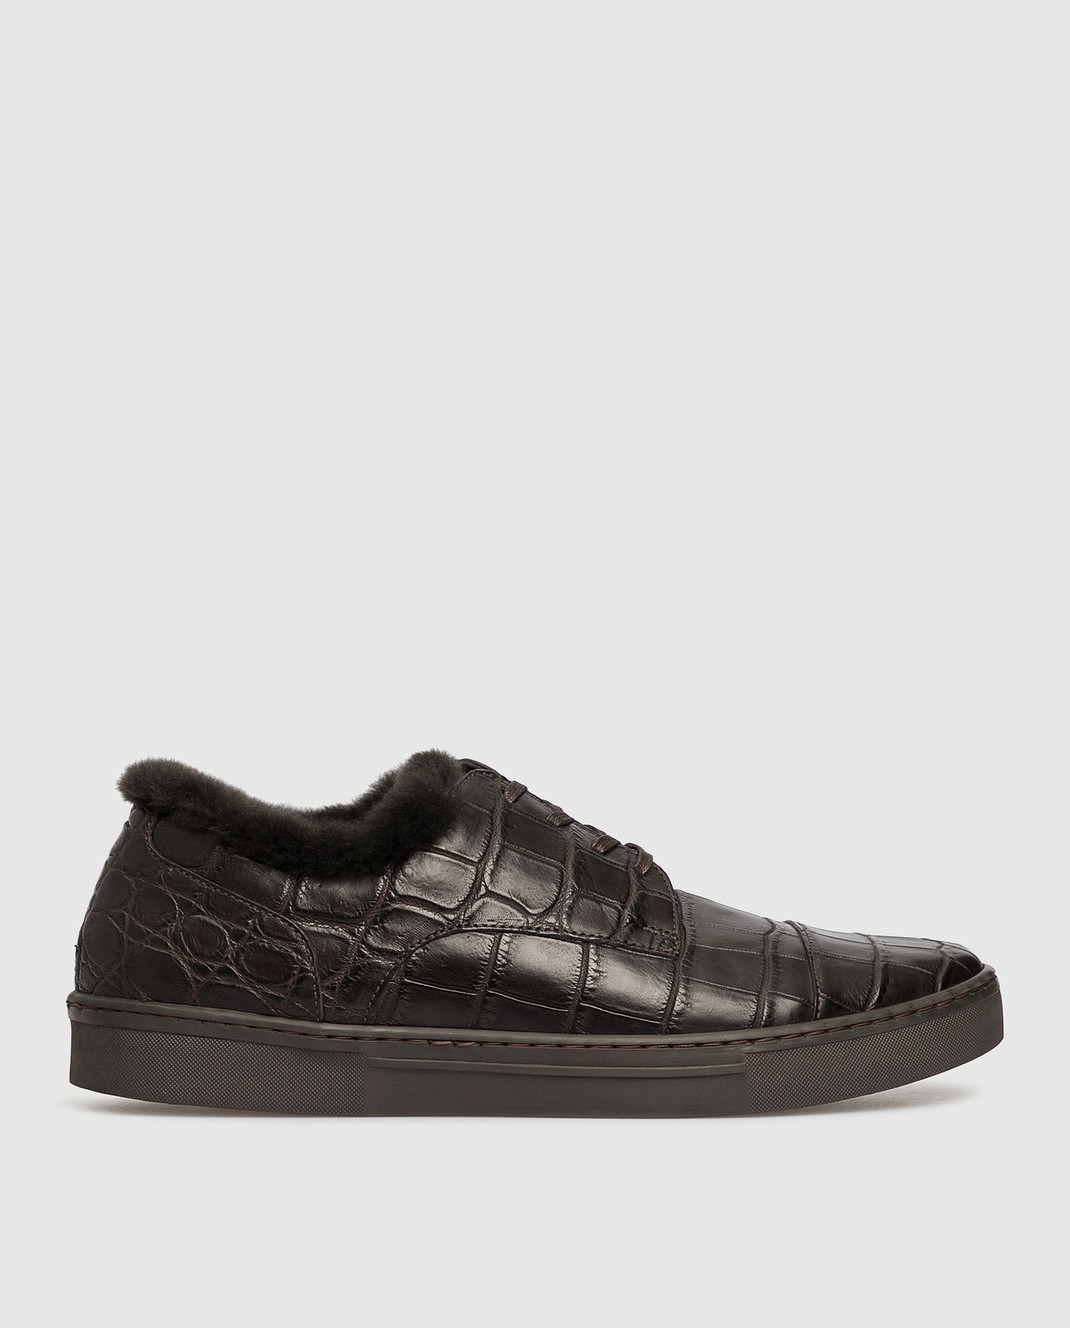 Del Dami Темно-коричневые ботинки из кожи крокодила на меху 3604